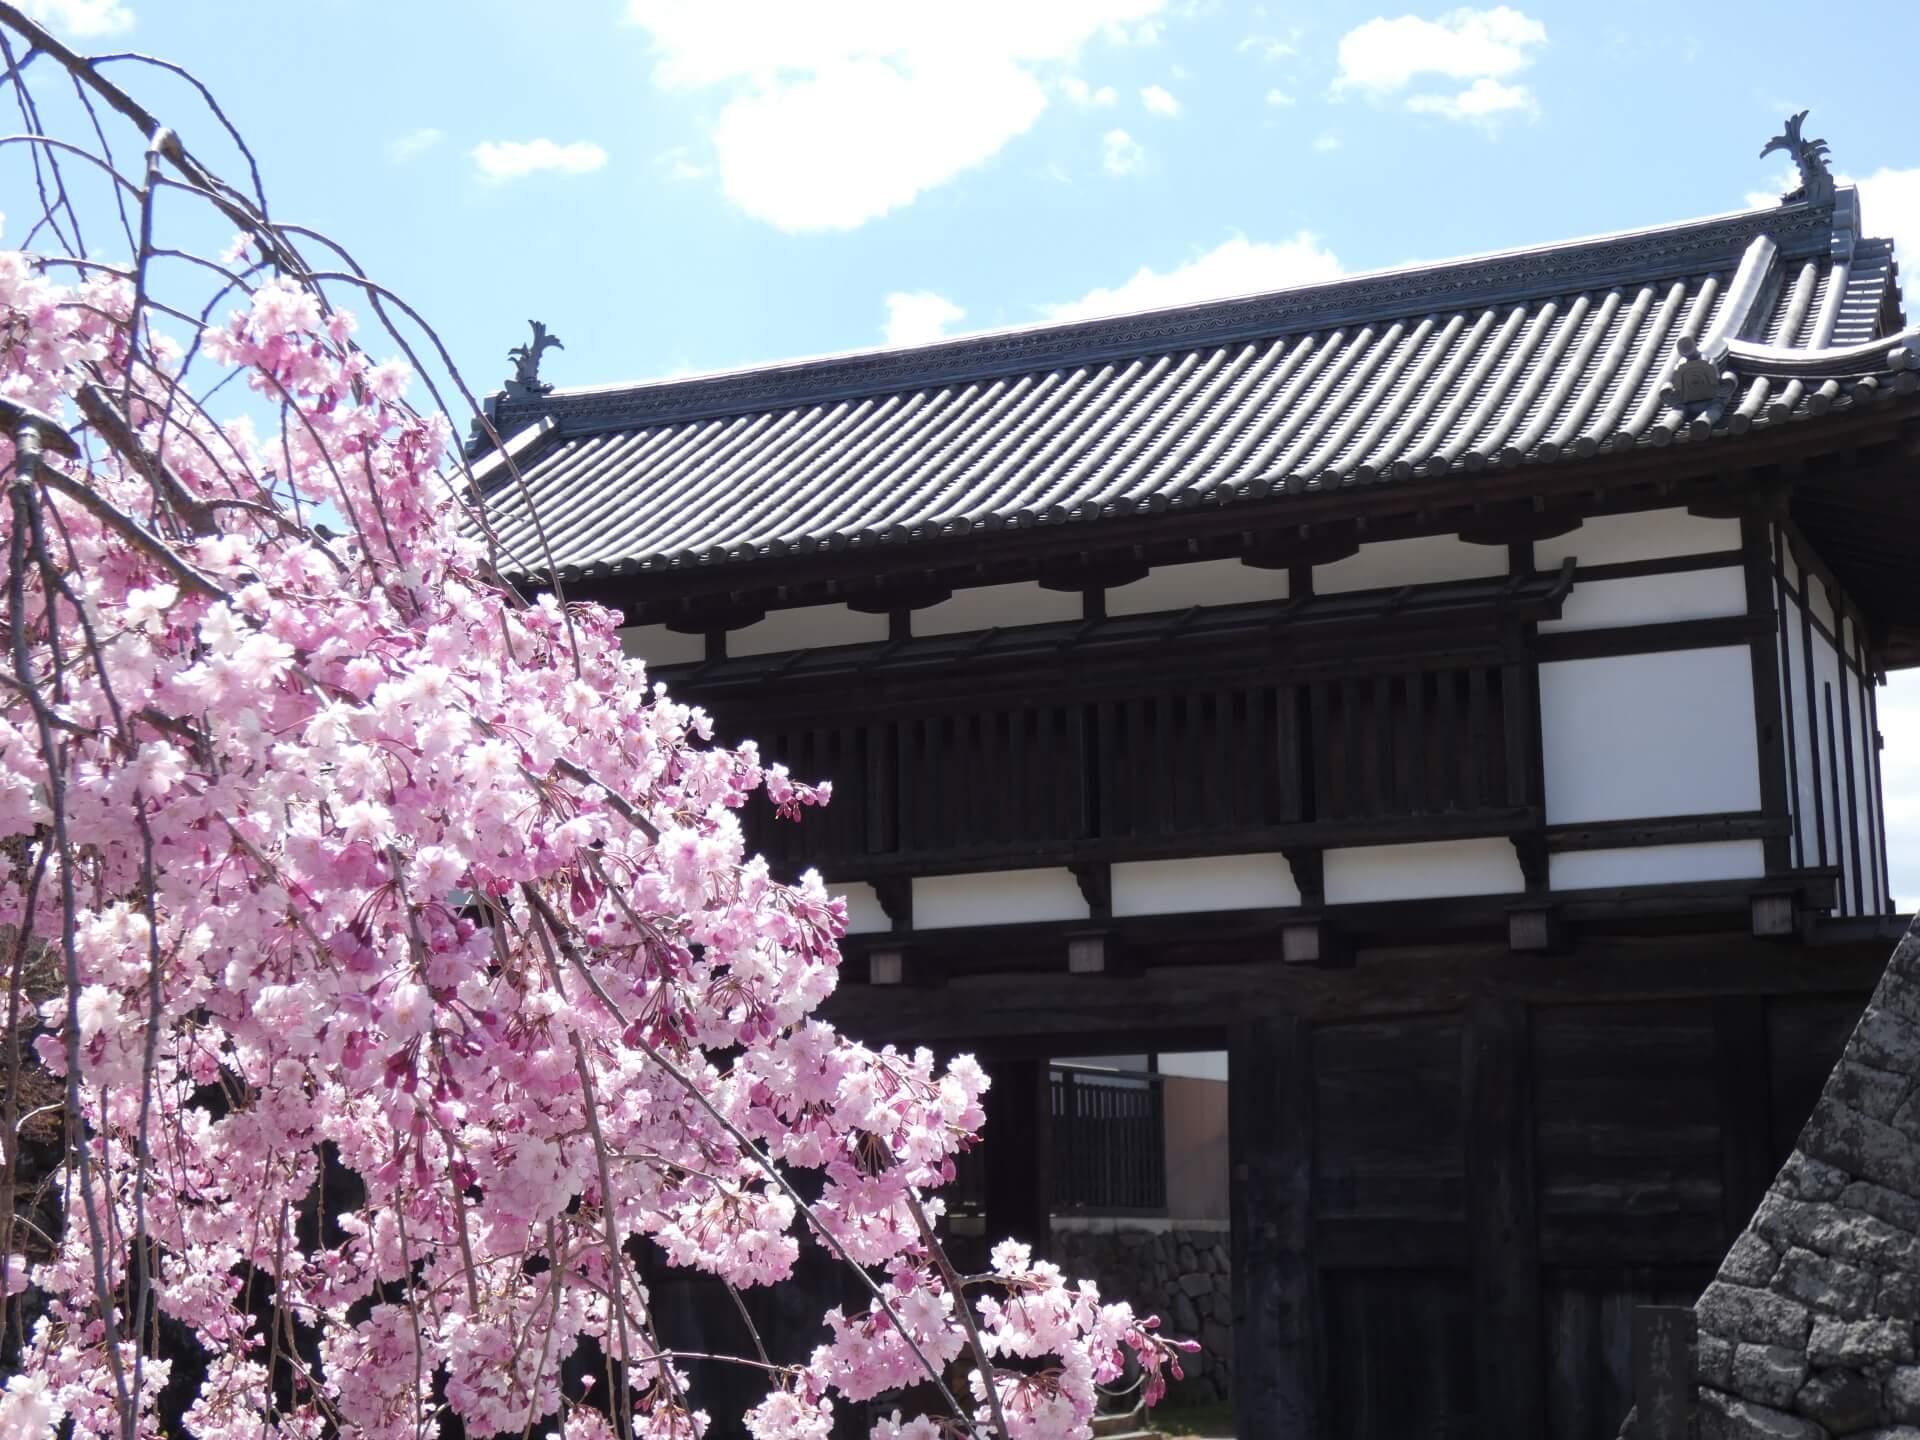 komoro-park-blossoms